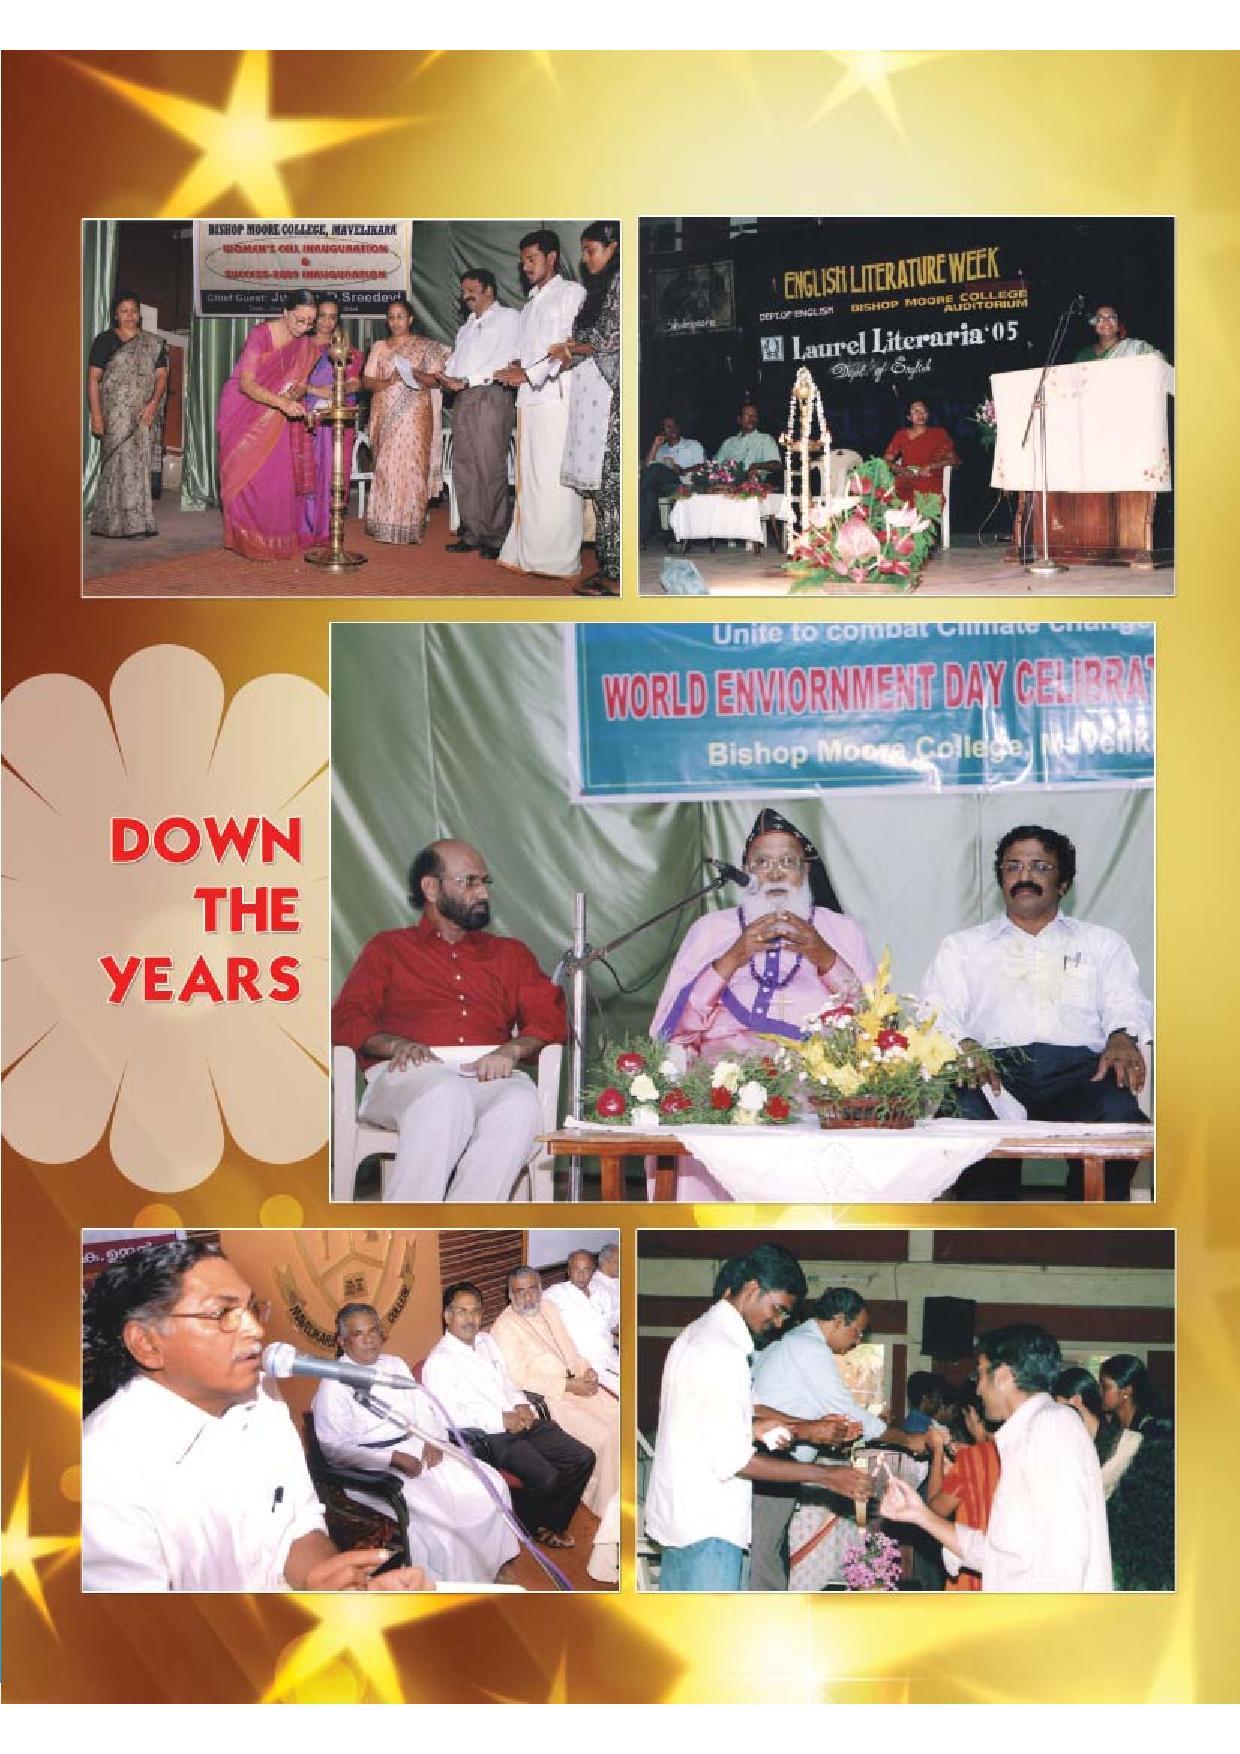 http://bishopmoorecollege.org/past-years/